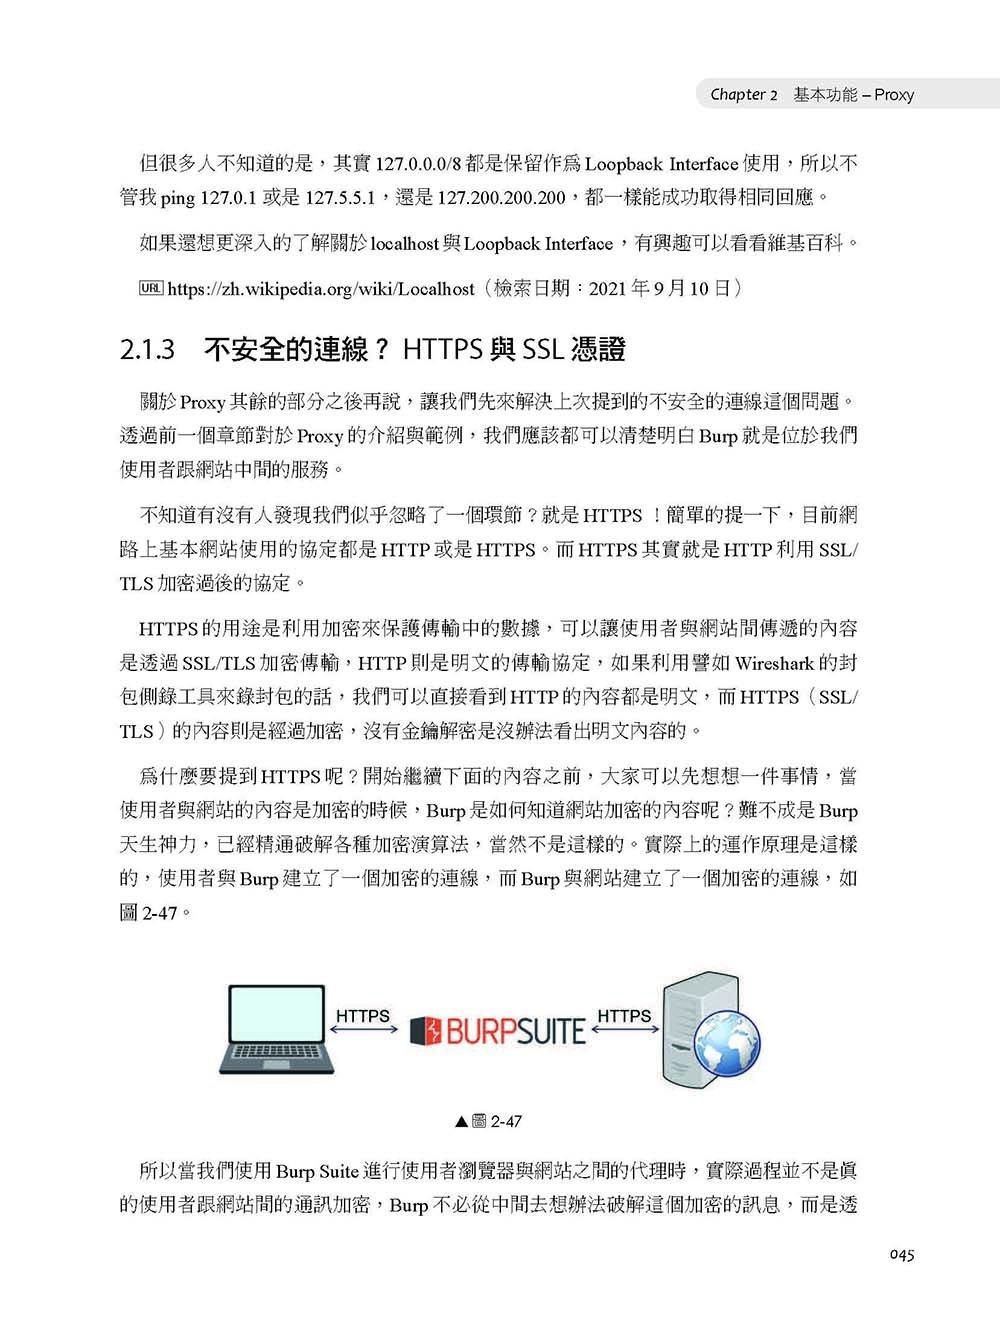 WebSecurity 網站滲透測試:Burp Suite 完全學習指南 (iT邦幫忙鐵人賽系列書)-preview-5